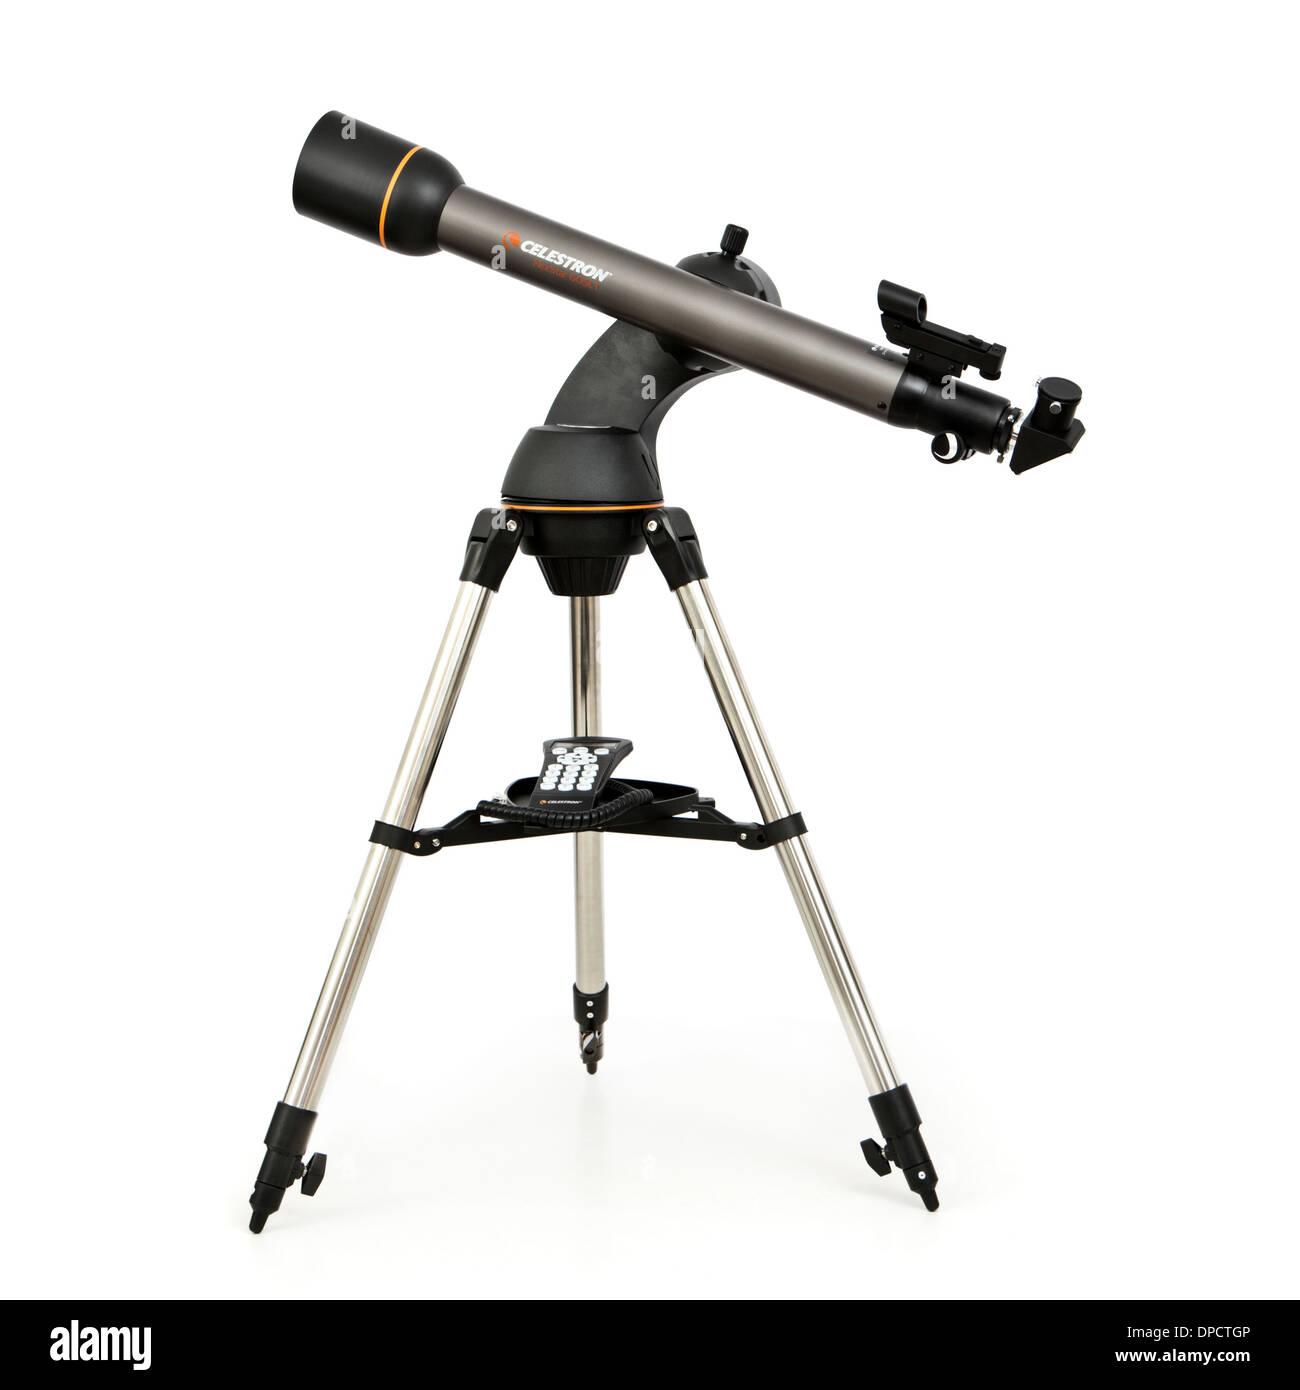 Celestron NexStar 60SLT Motorized Refracting Telescope - Stock Image